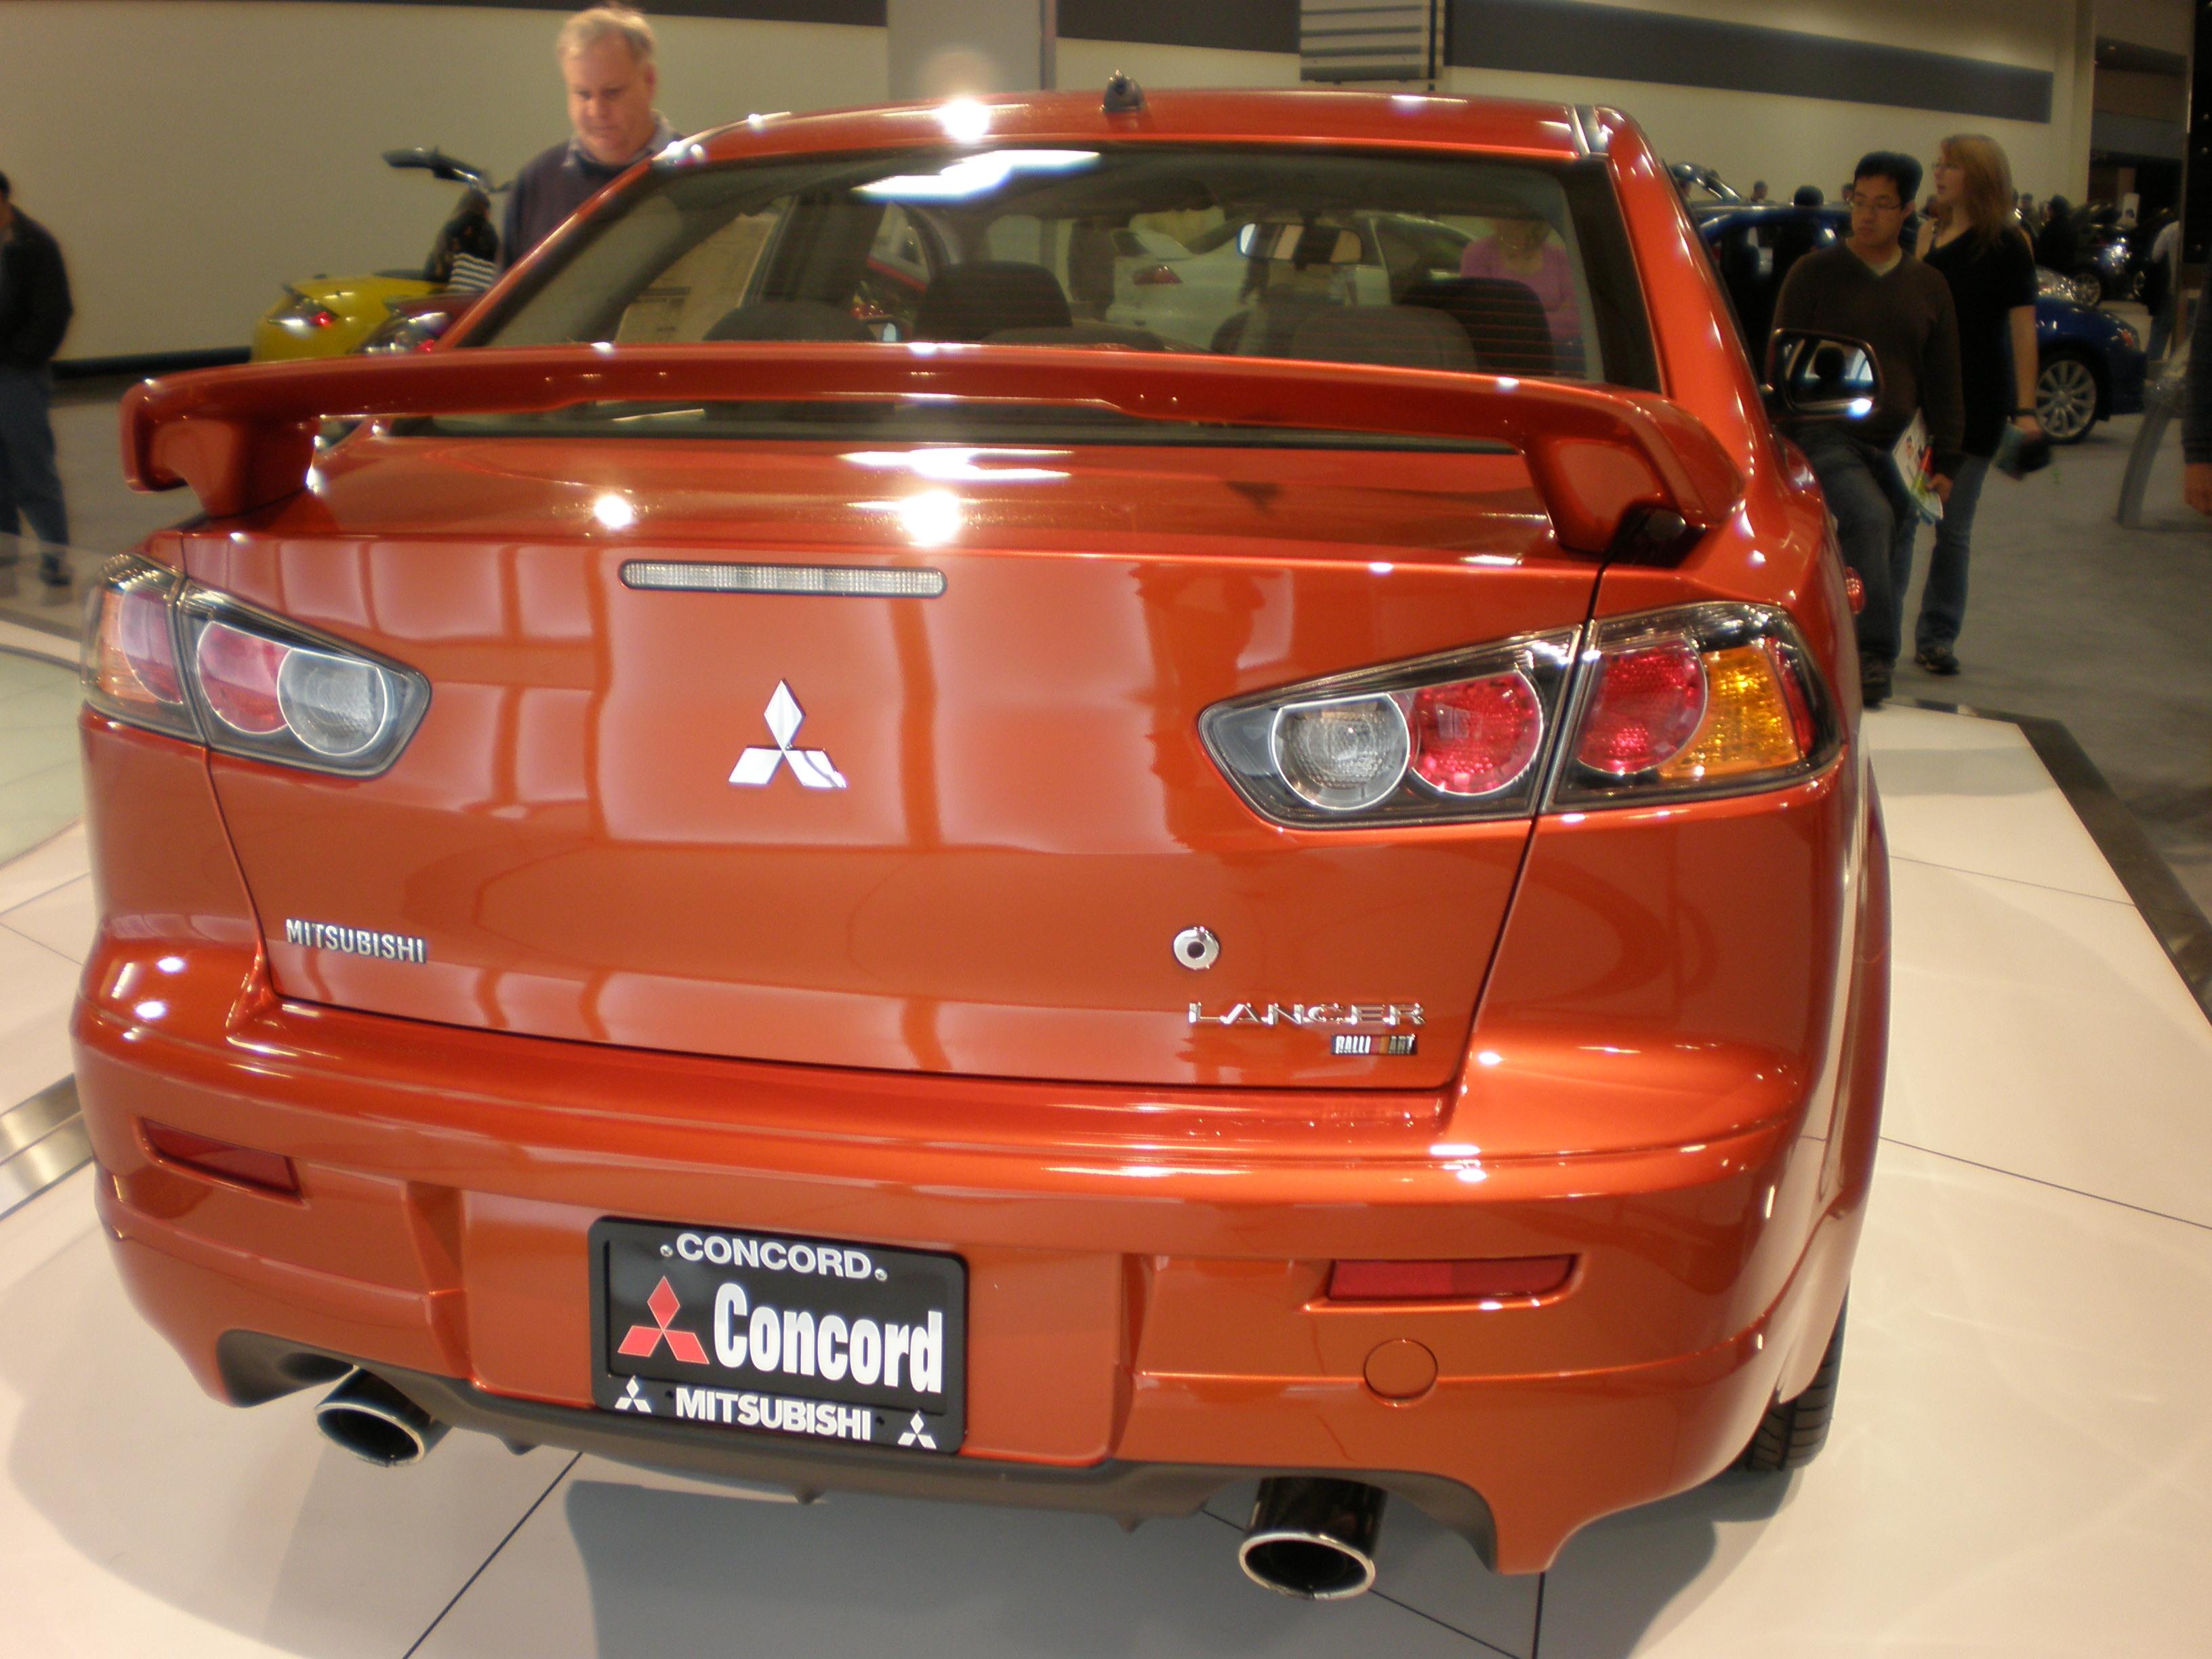 File 2009 Orange Mitsubishi Lancer Ralliart Sedan Rear Jpg Wikimedia Commons